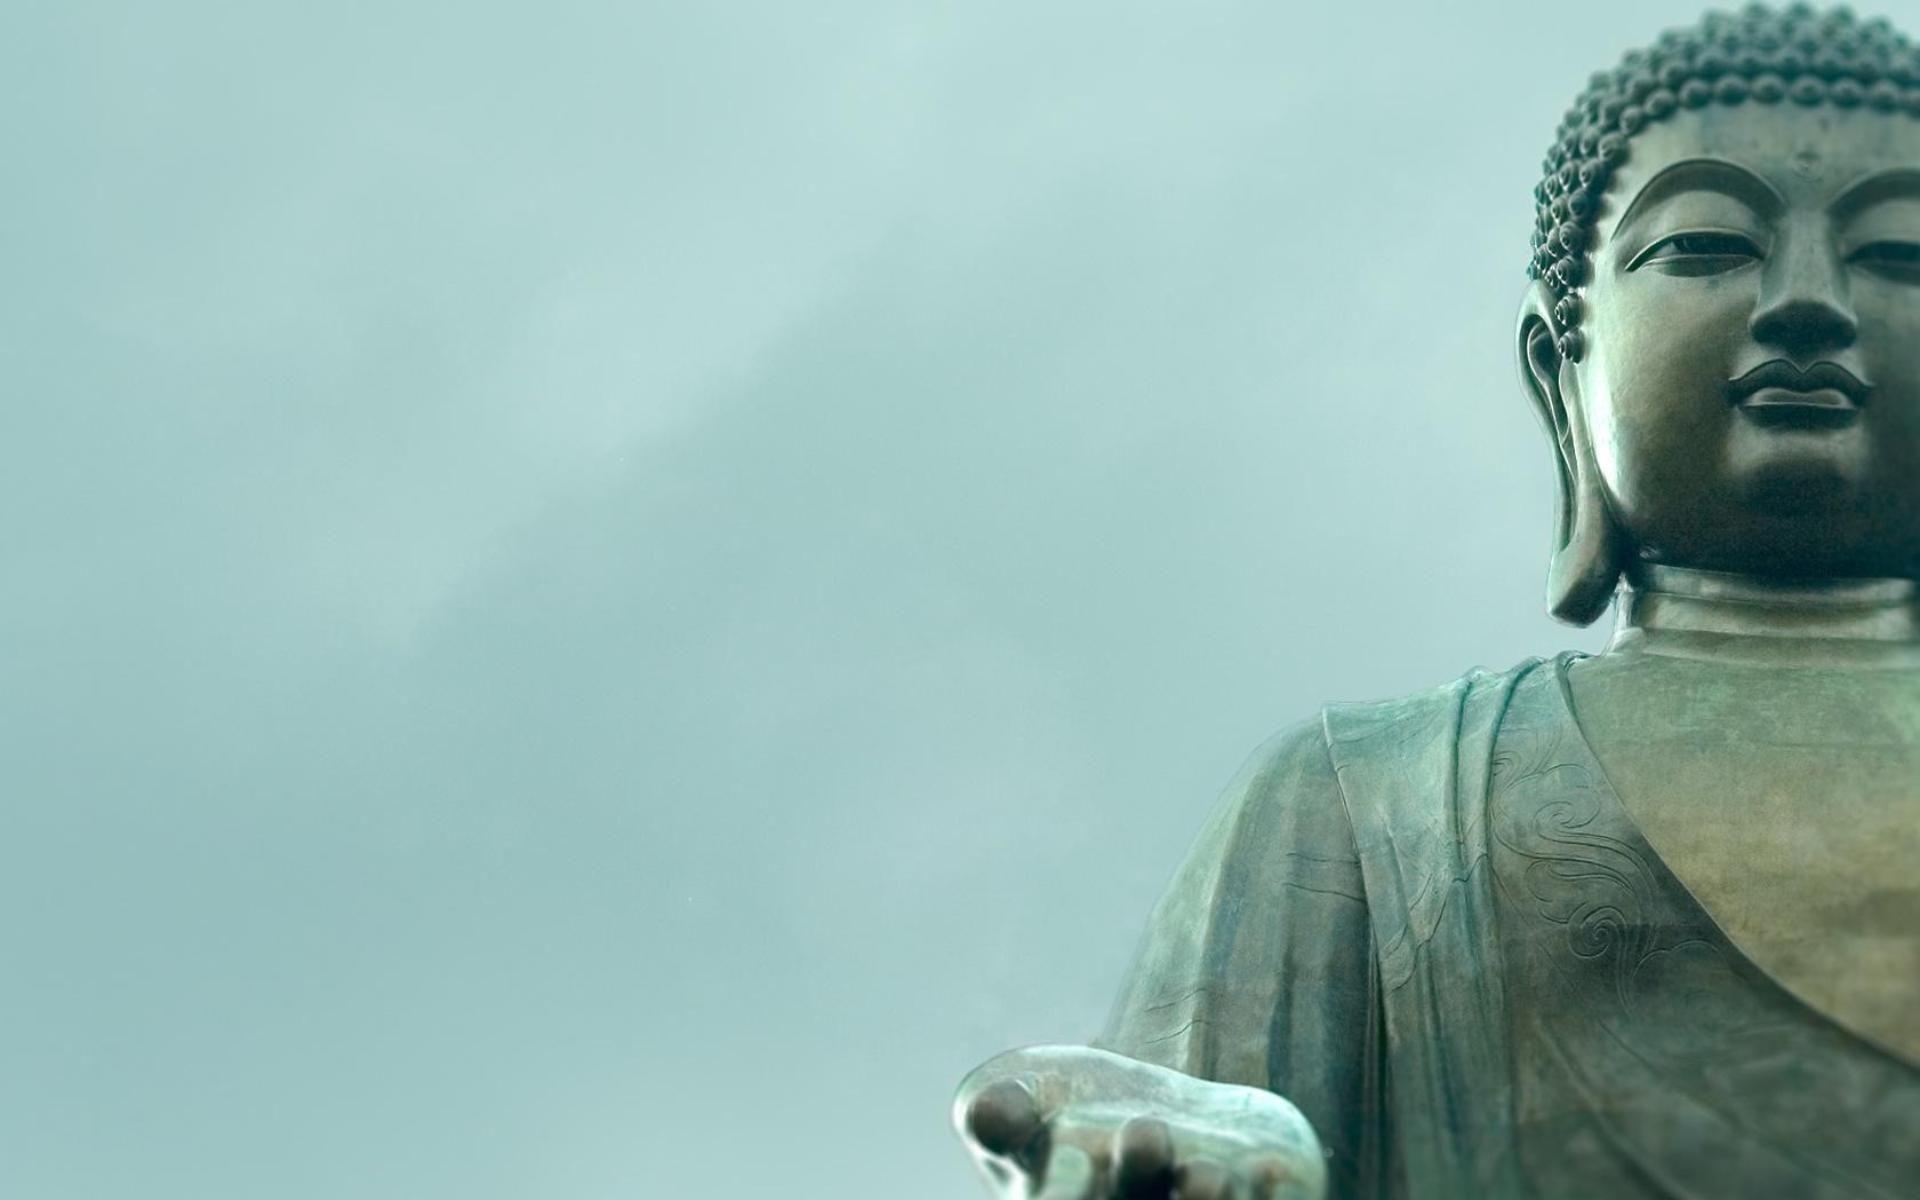 Buddha Download Desktop Wallpaper Hd Jpg 1 280 1 024 Pixels Buddha Zen Buddha Mindfulness